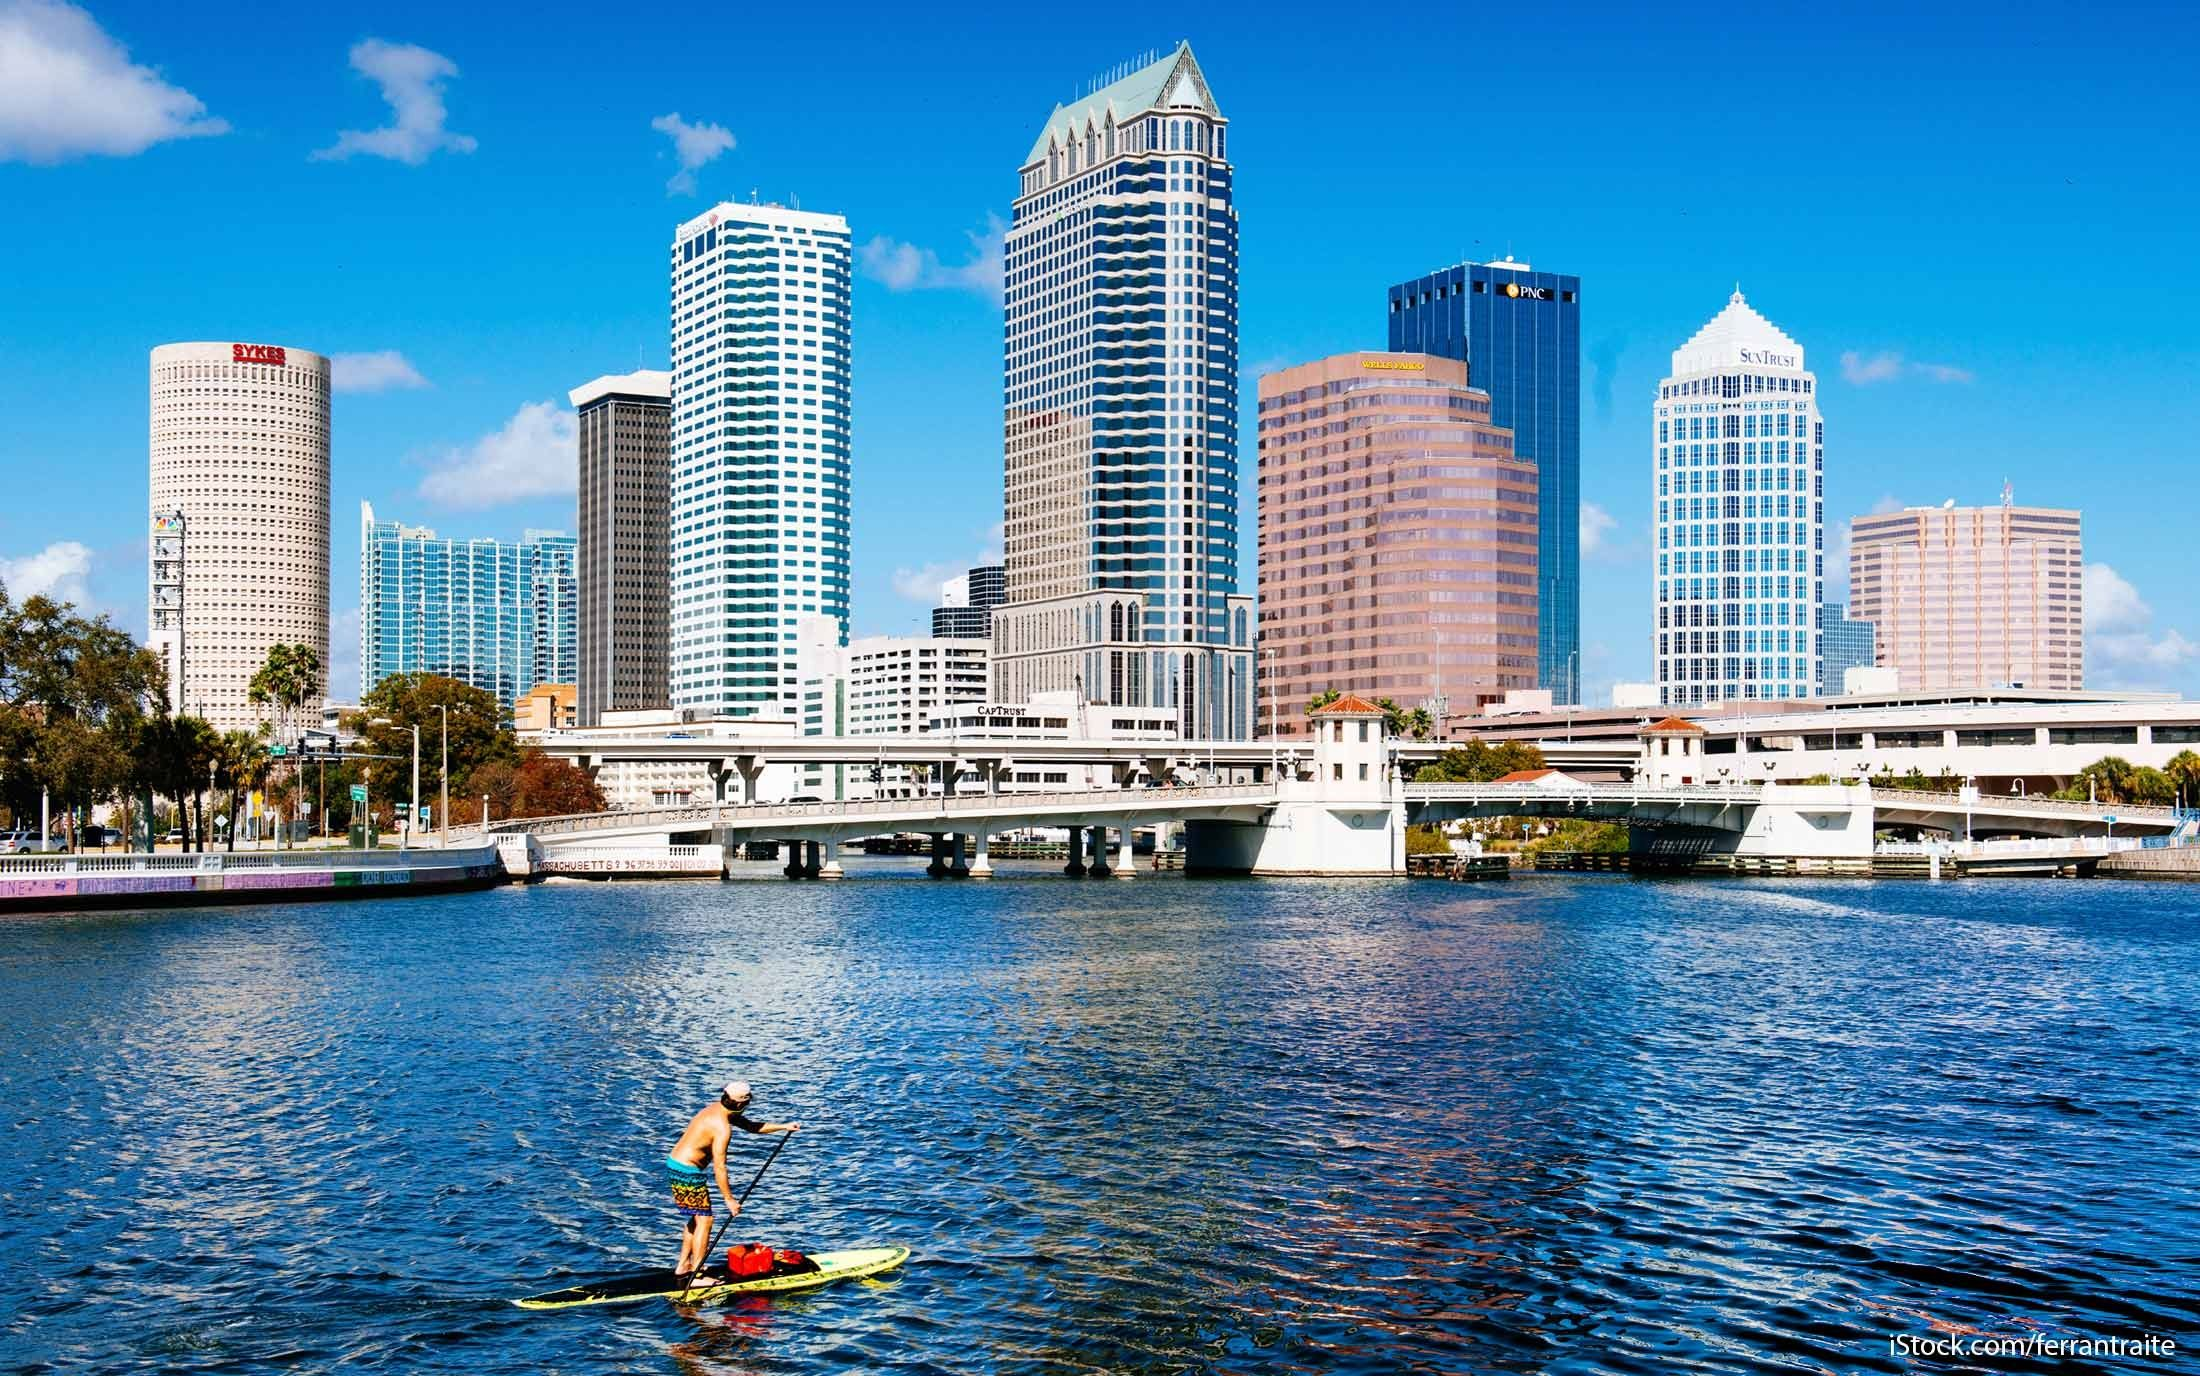 Tampa checking account